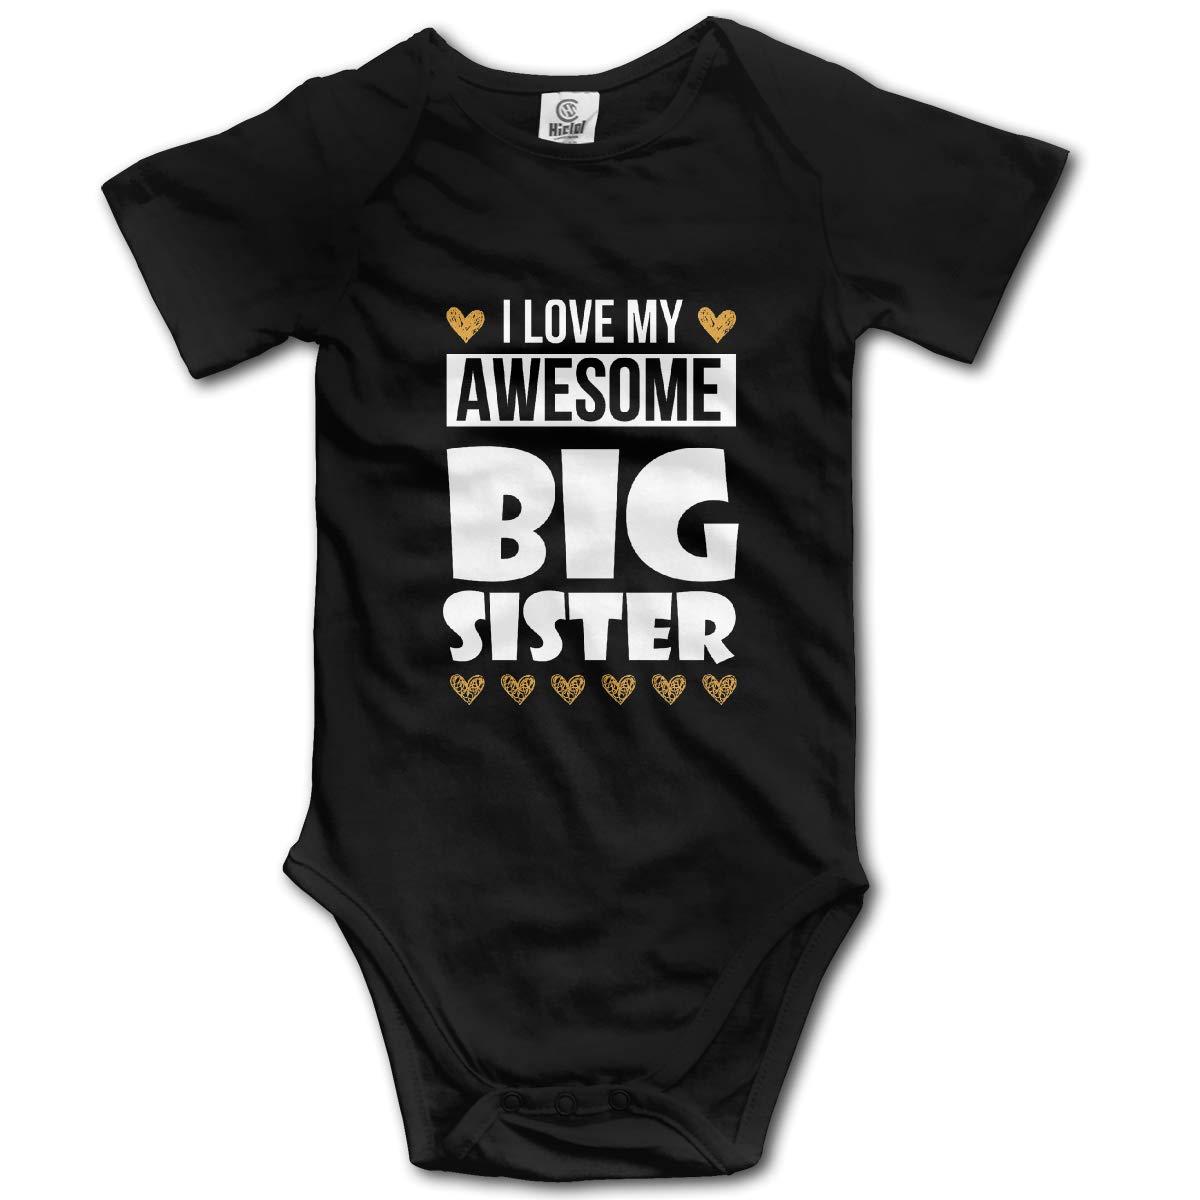 I Love My Big Sister Toddler Baby Romper Summer Short Sleeve Onesie Funny Gift